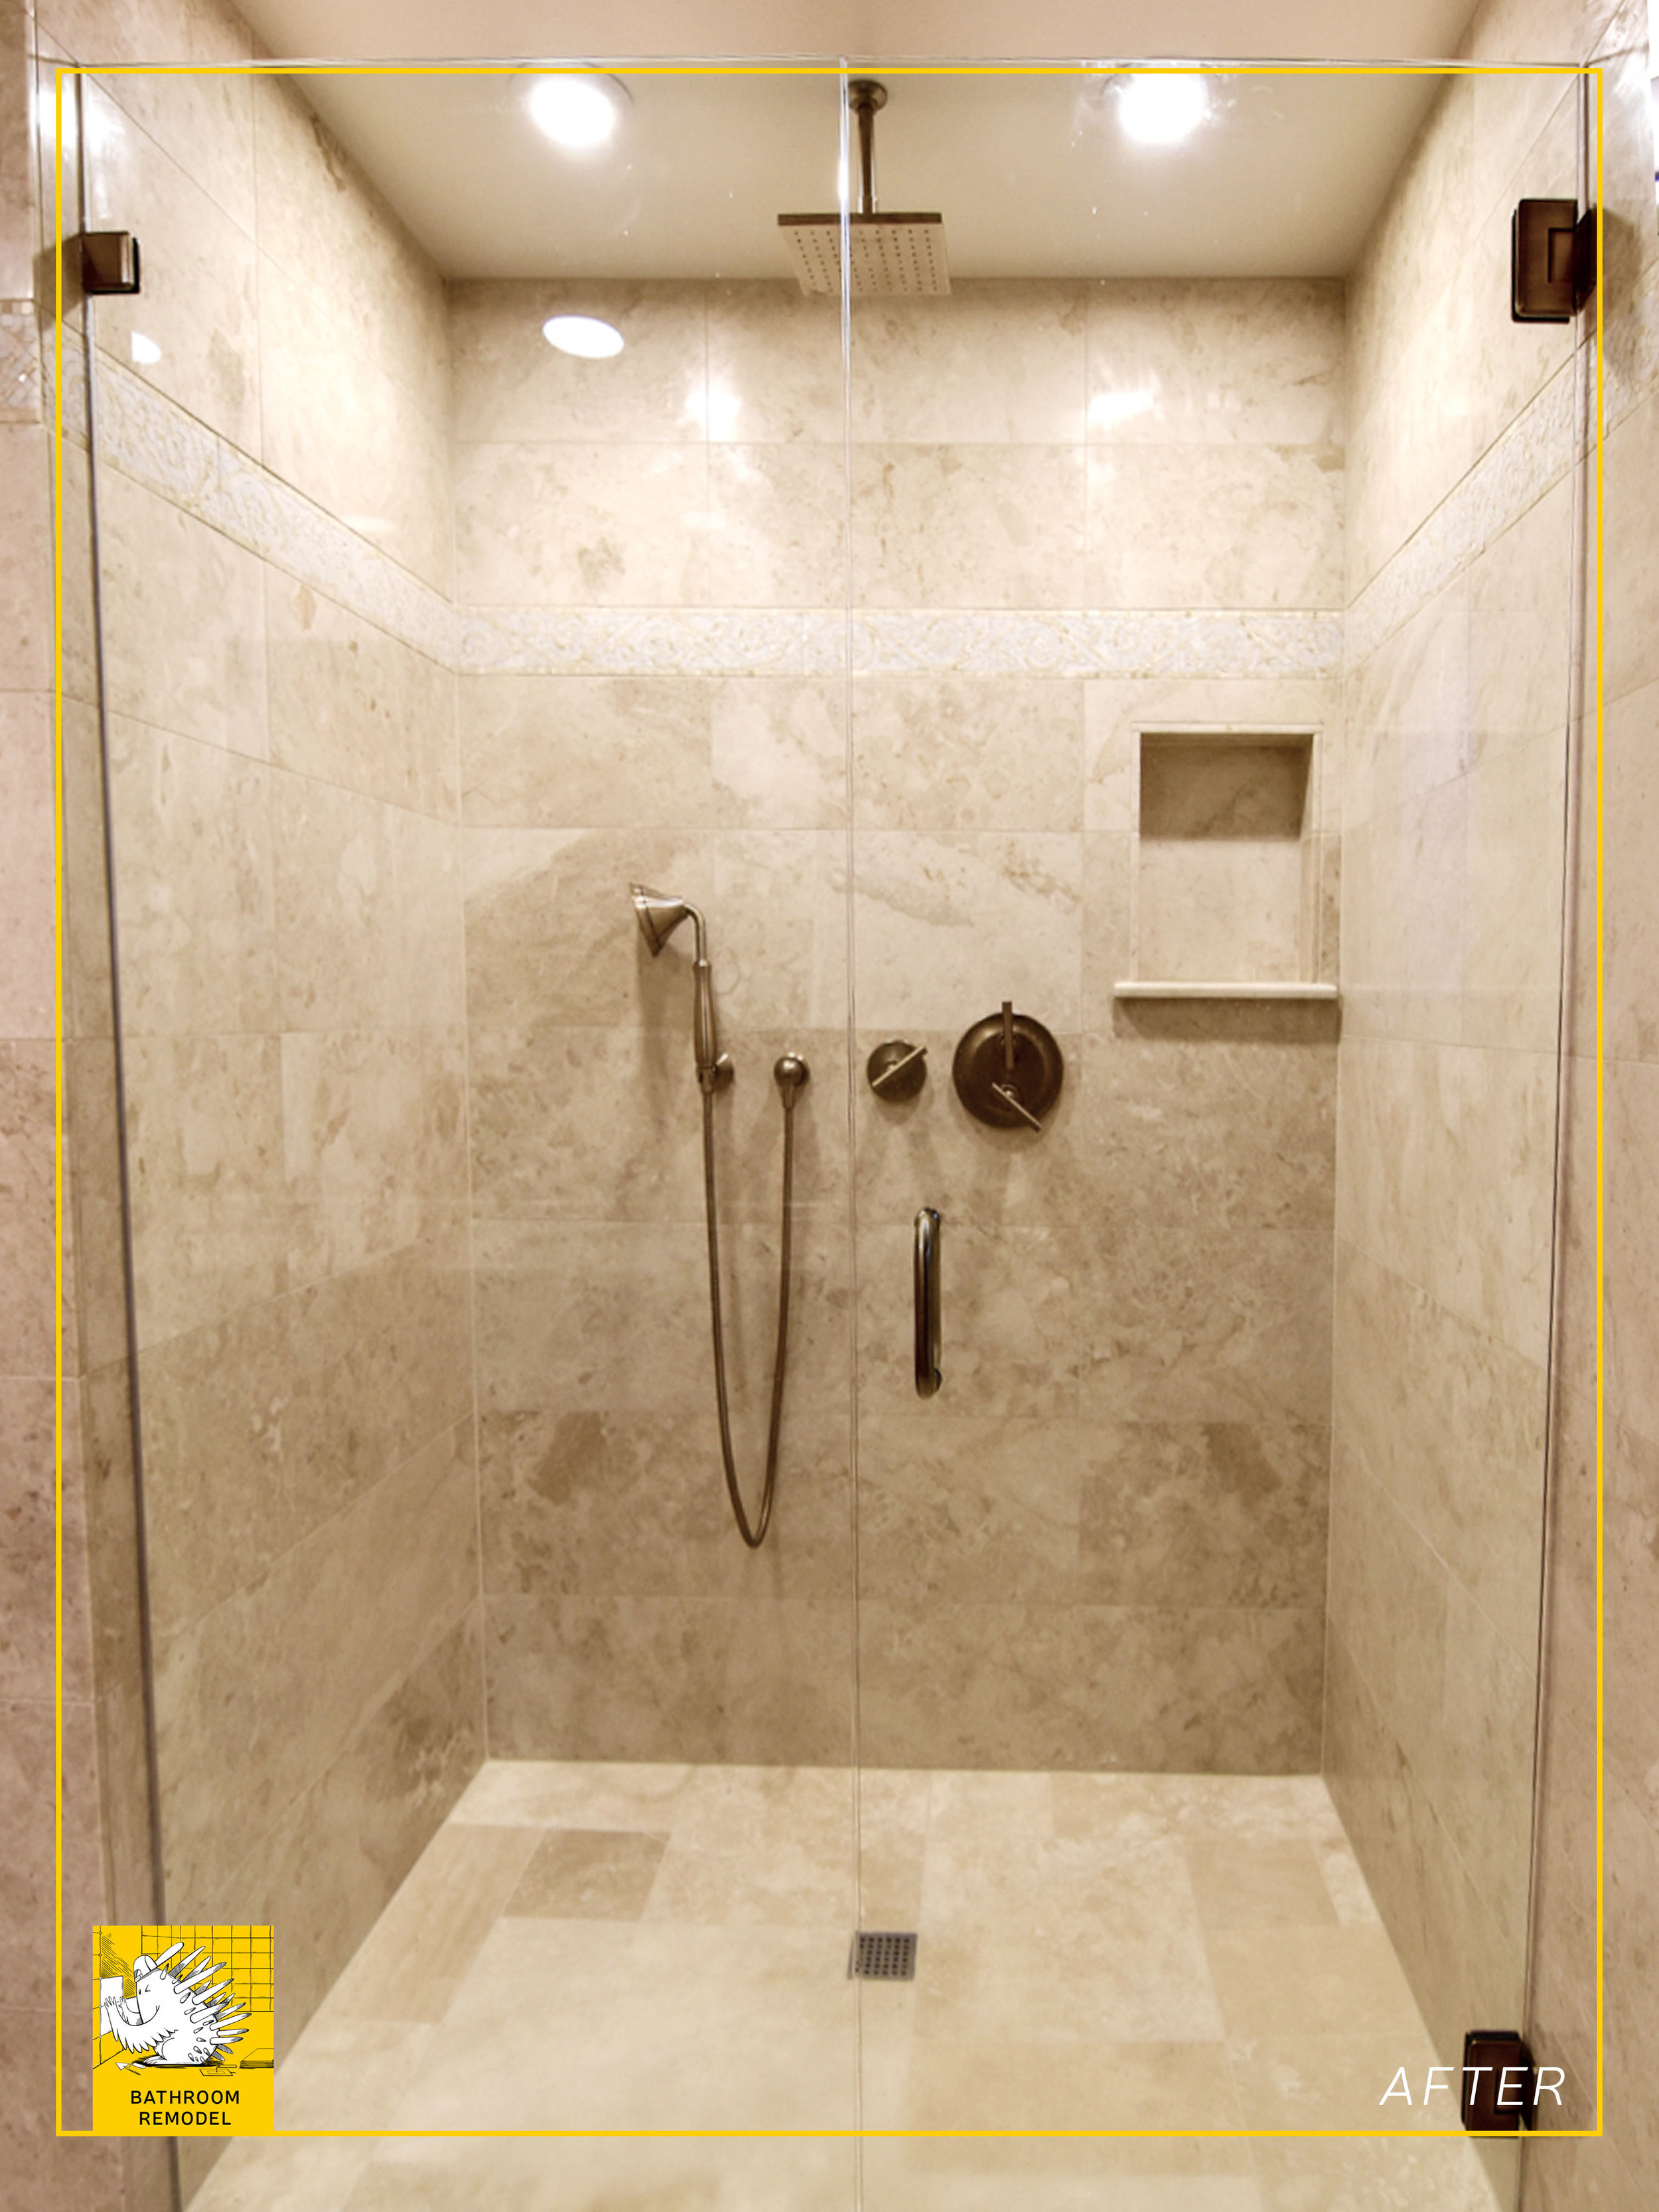 MT bathroom 2 after 1.jpg